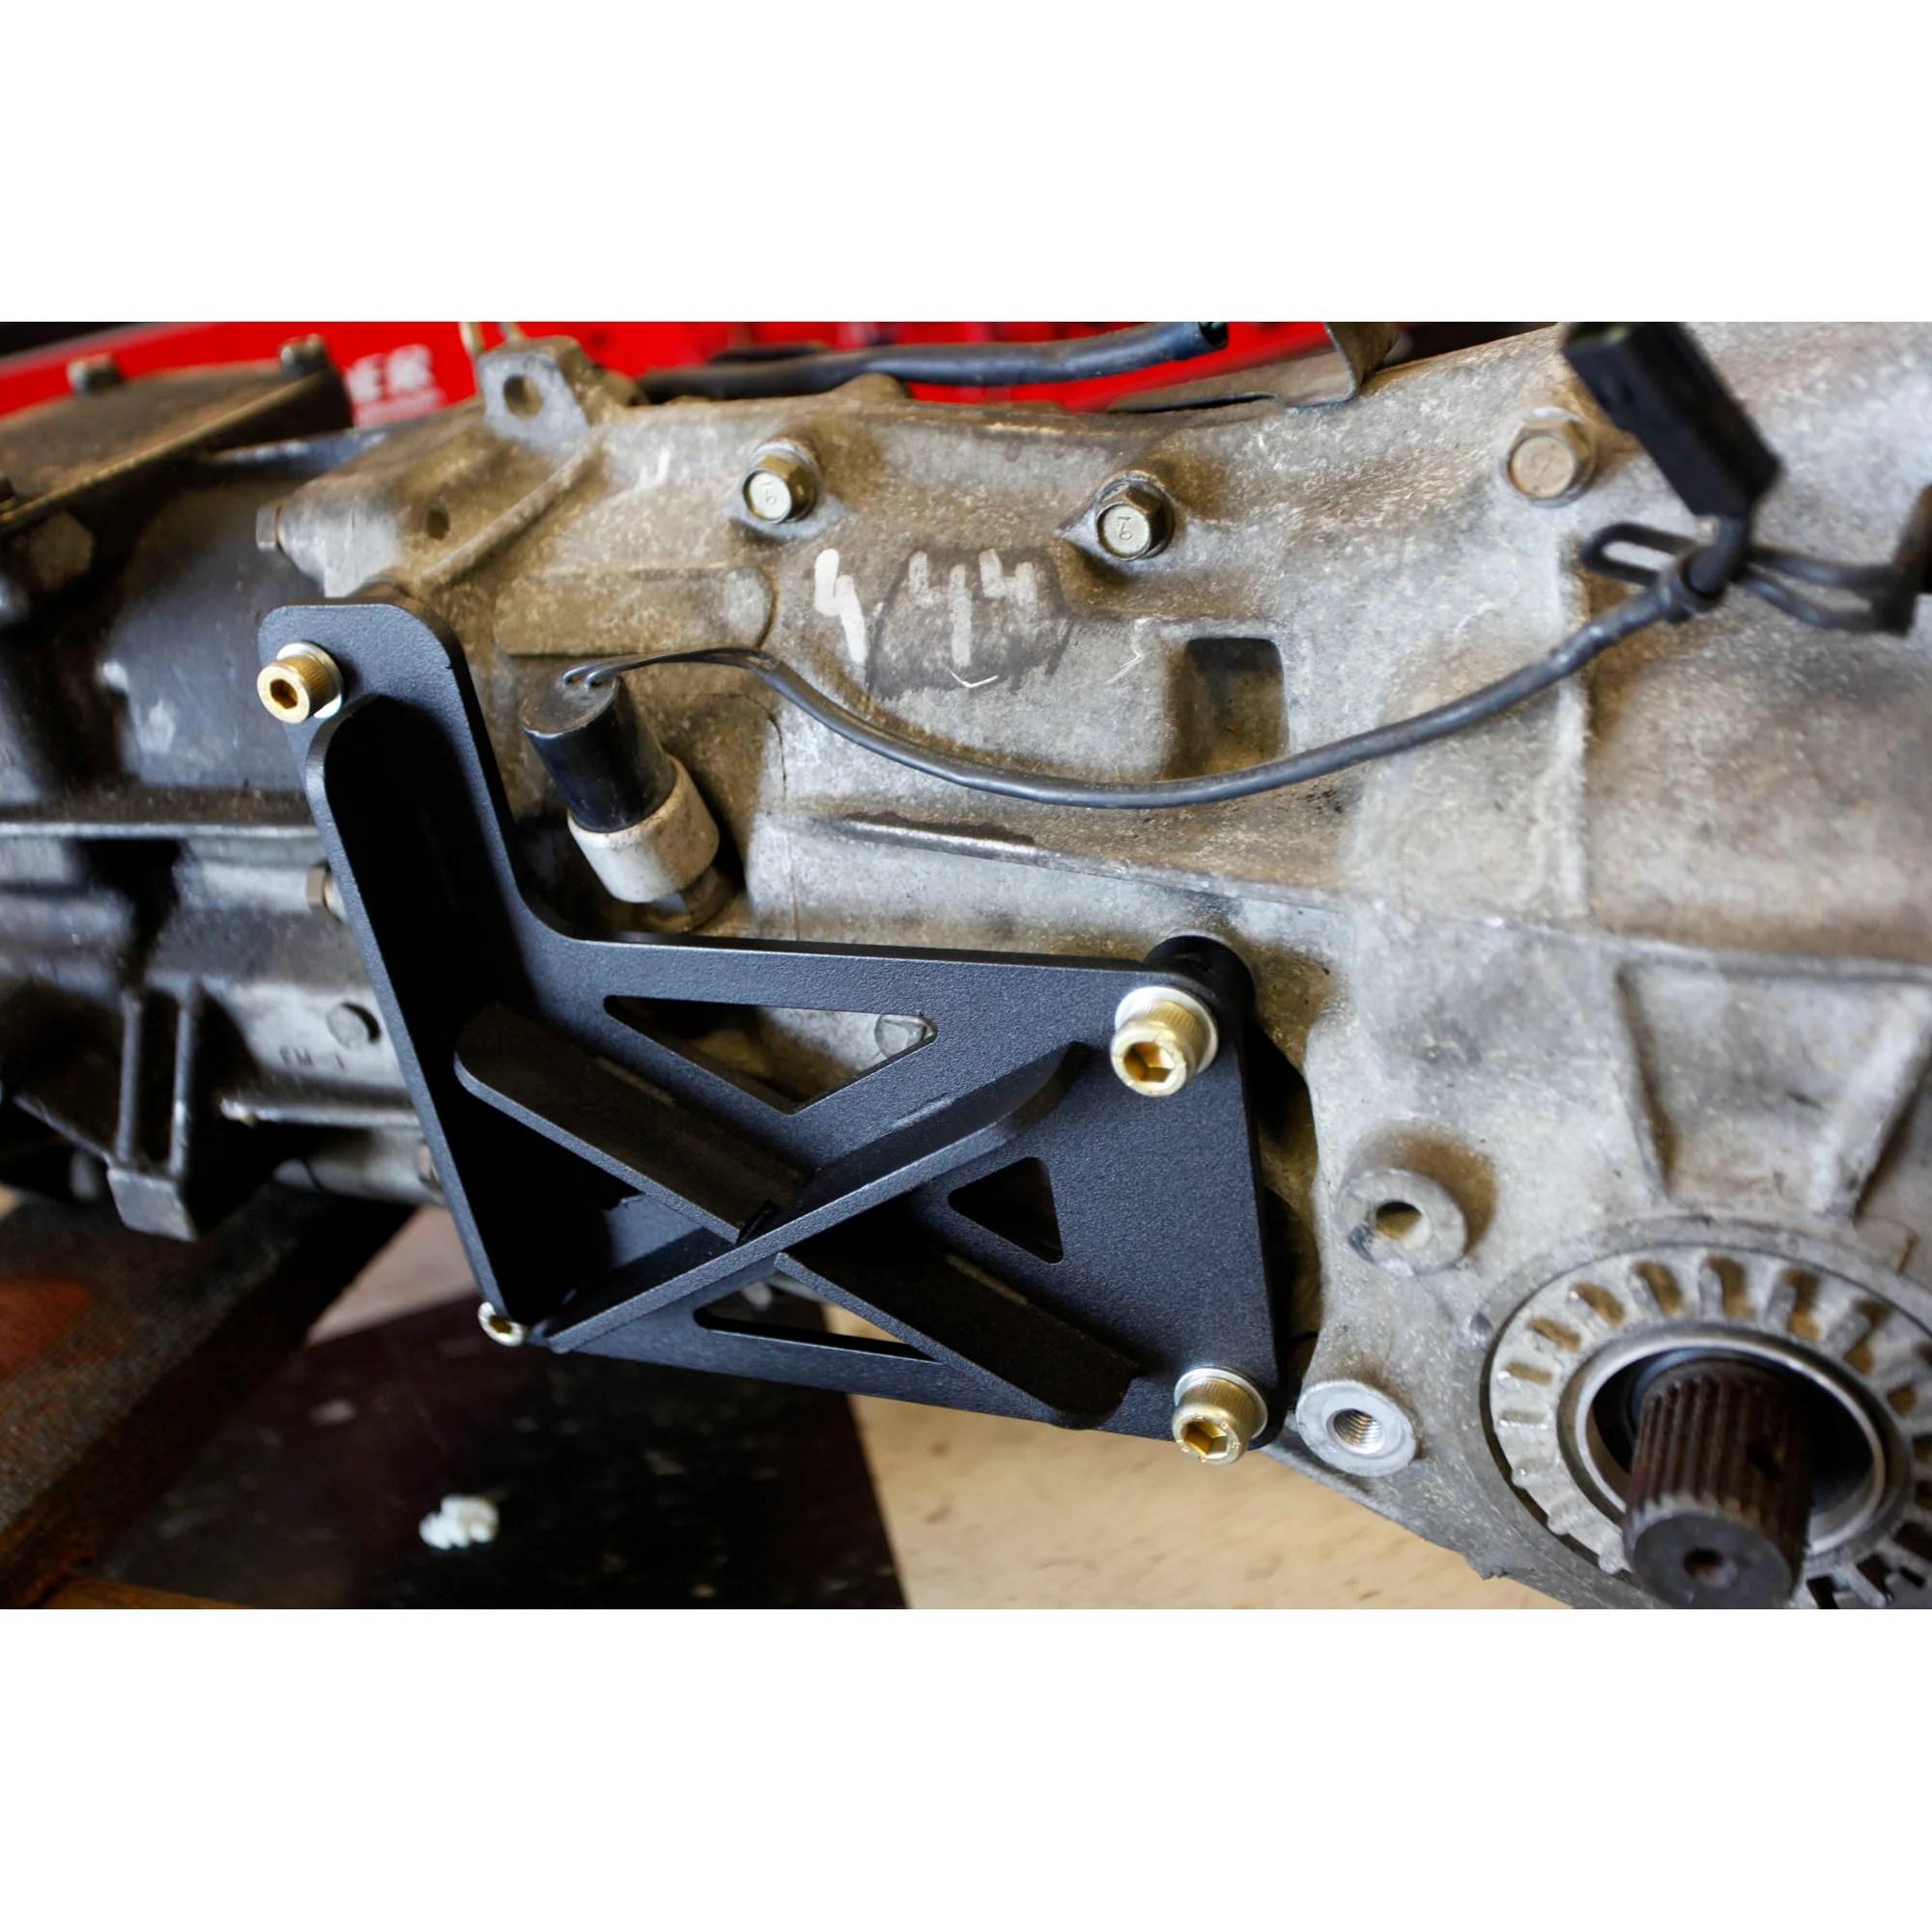 medium resolution of mach v transmission reinforcement brace kit subaru 5mt